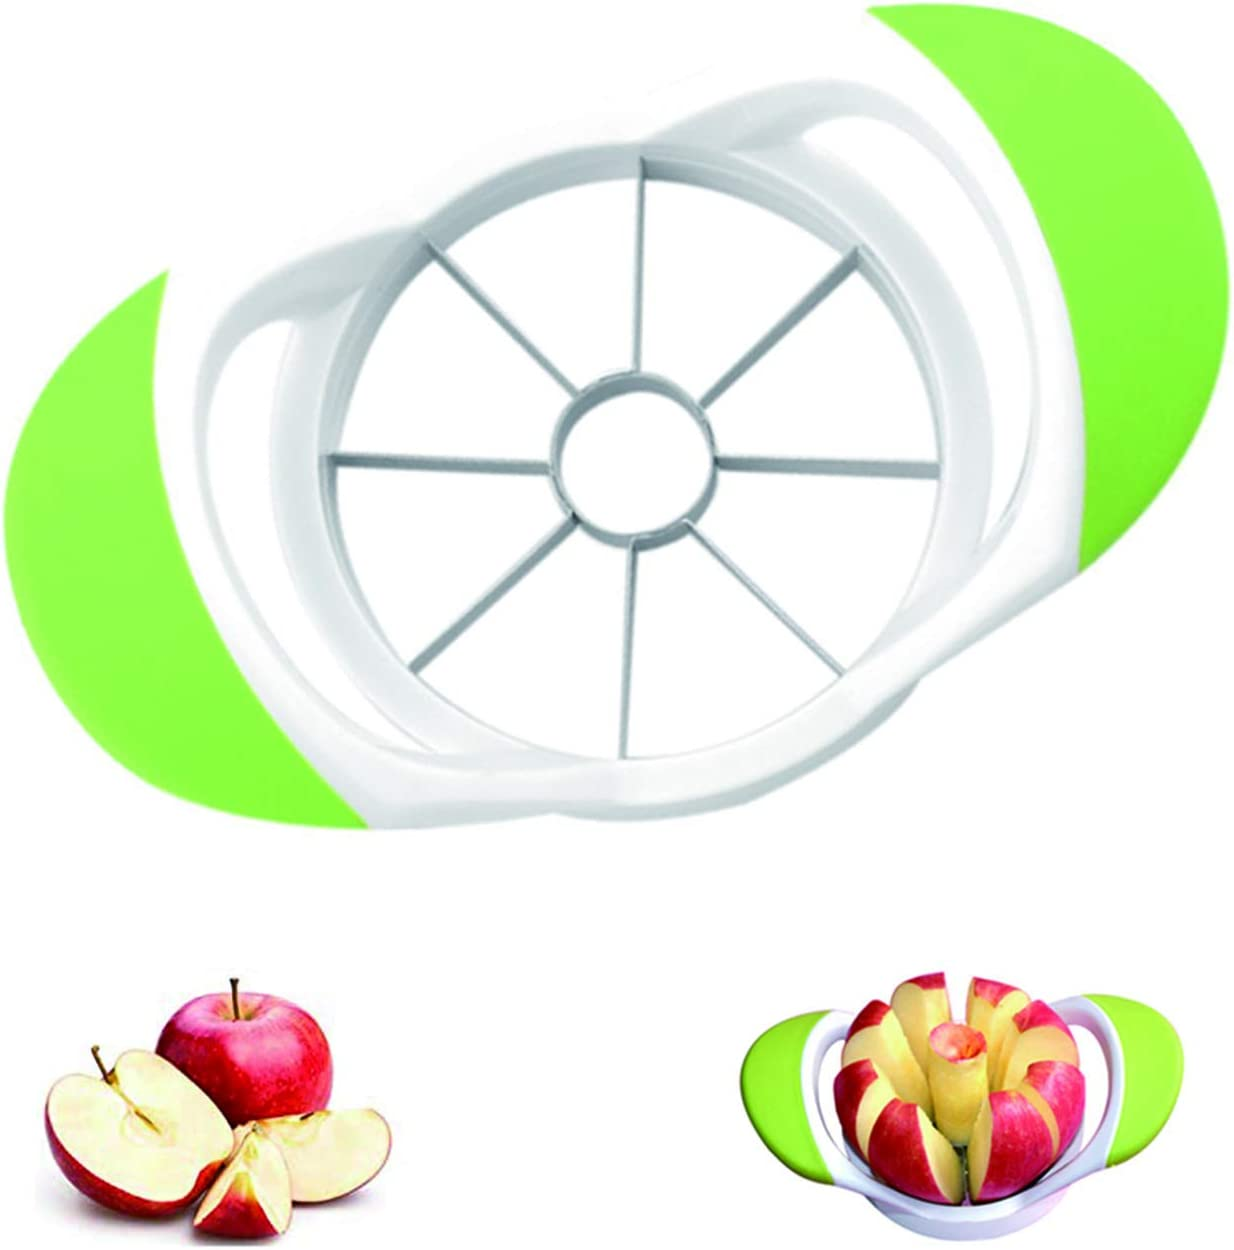 LYUSan Apple Slicer and Corer 8 Sharp Blades Apple Peeler Slicer Corer - 430 Grade Stainless Steel, 4.2 Inch Fruit Divider(Green)